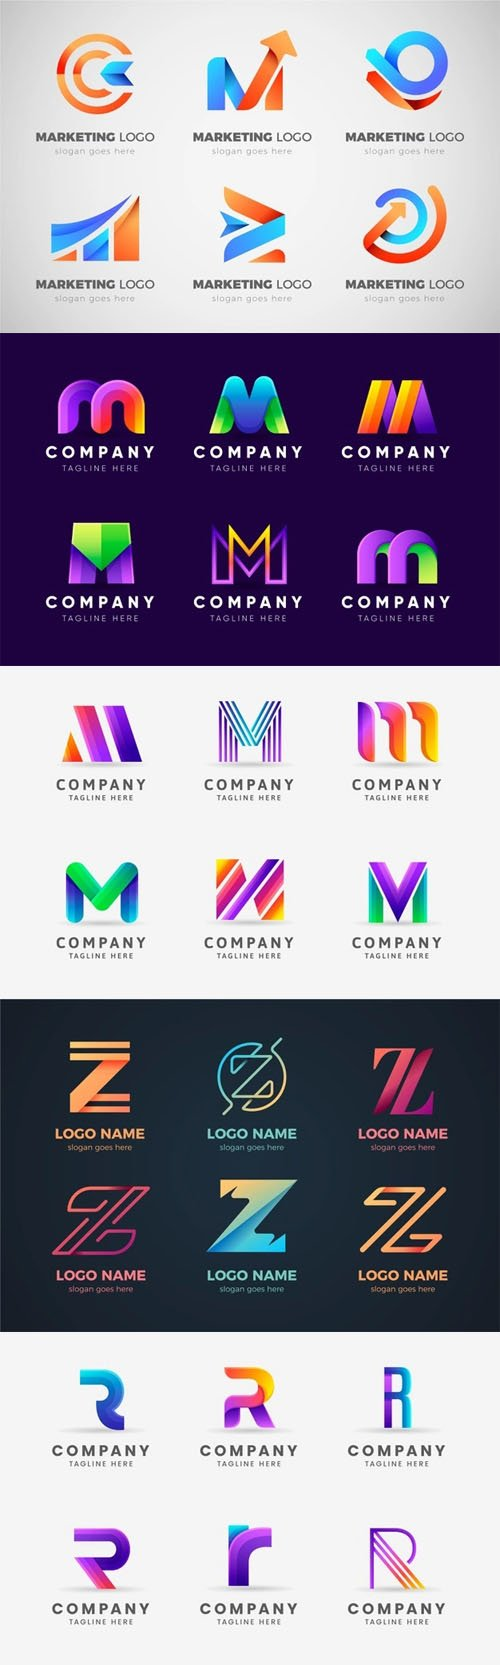 30 Gradient Logos Vector Collection